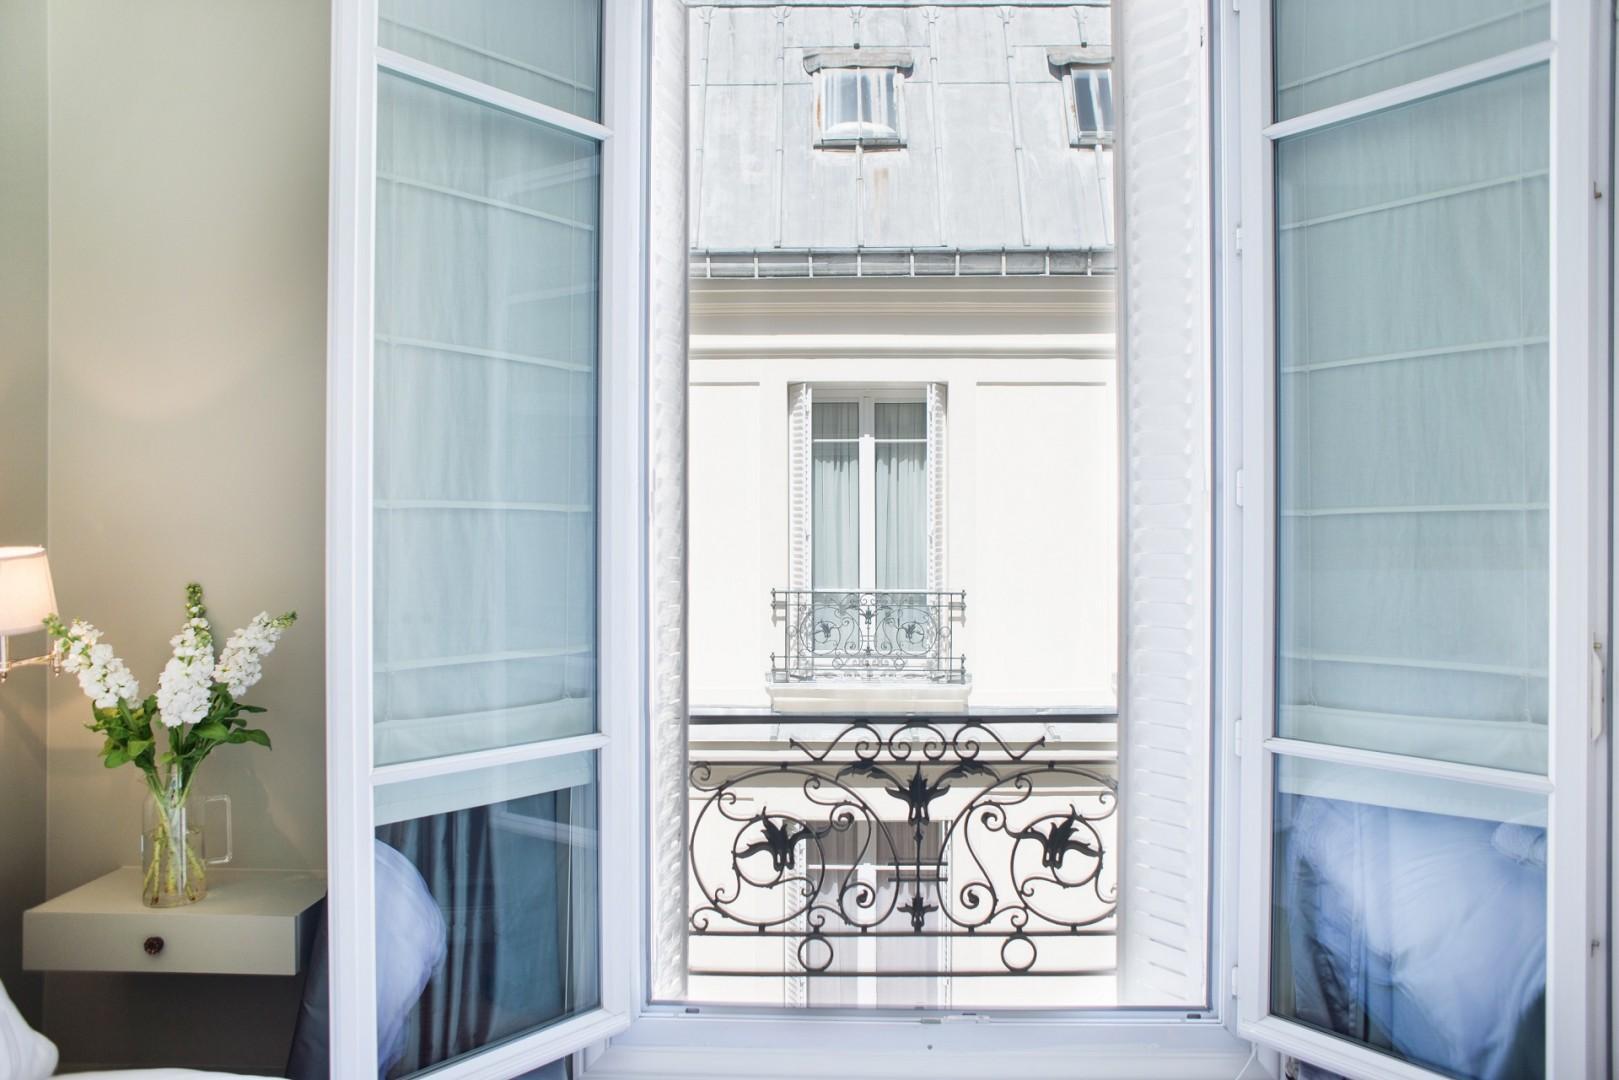 Enjoy the classic Haussmann-style building.